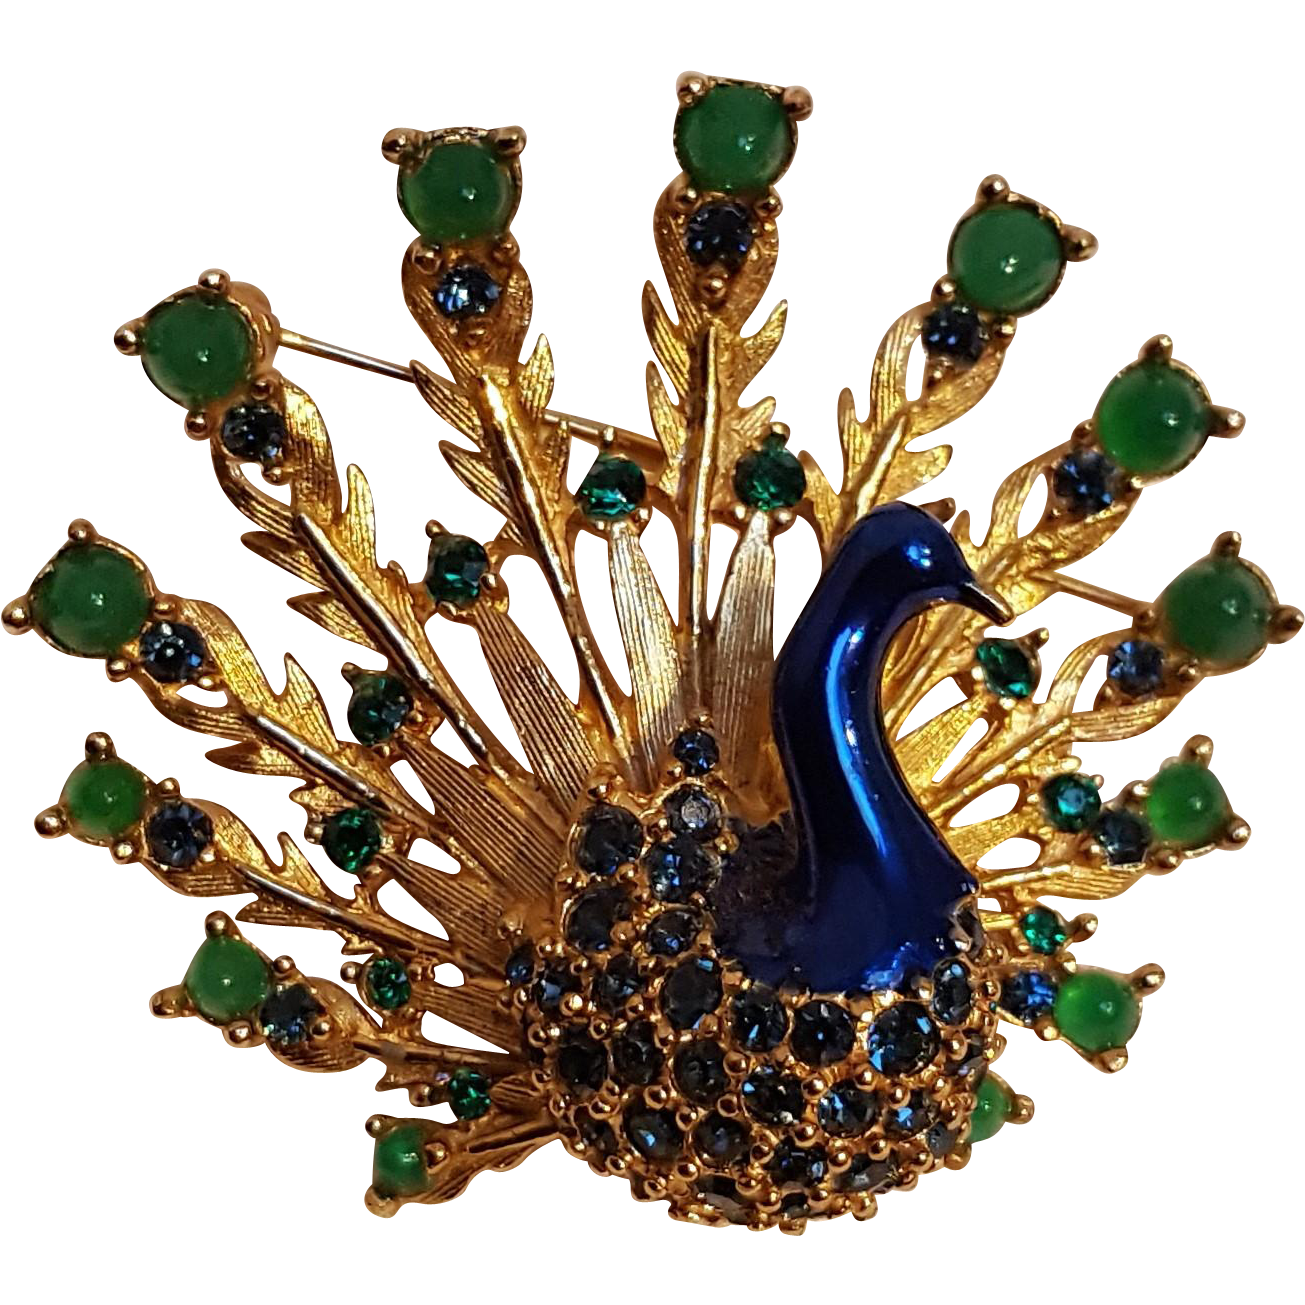 Boucher peacock pin  enamel glass cabochon rhinestone